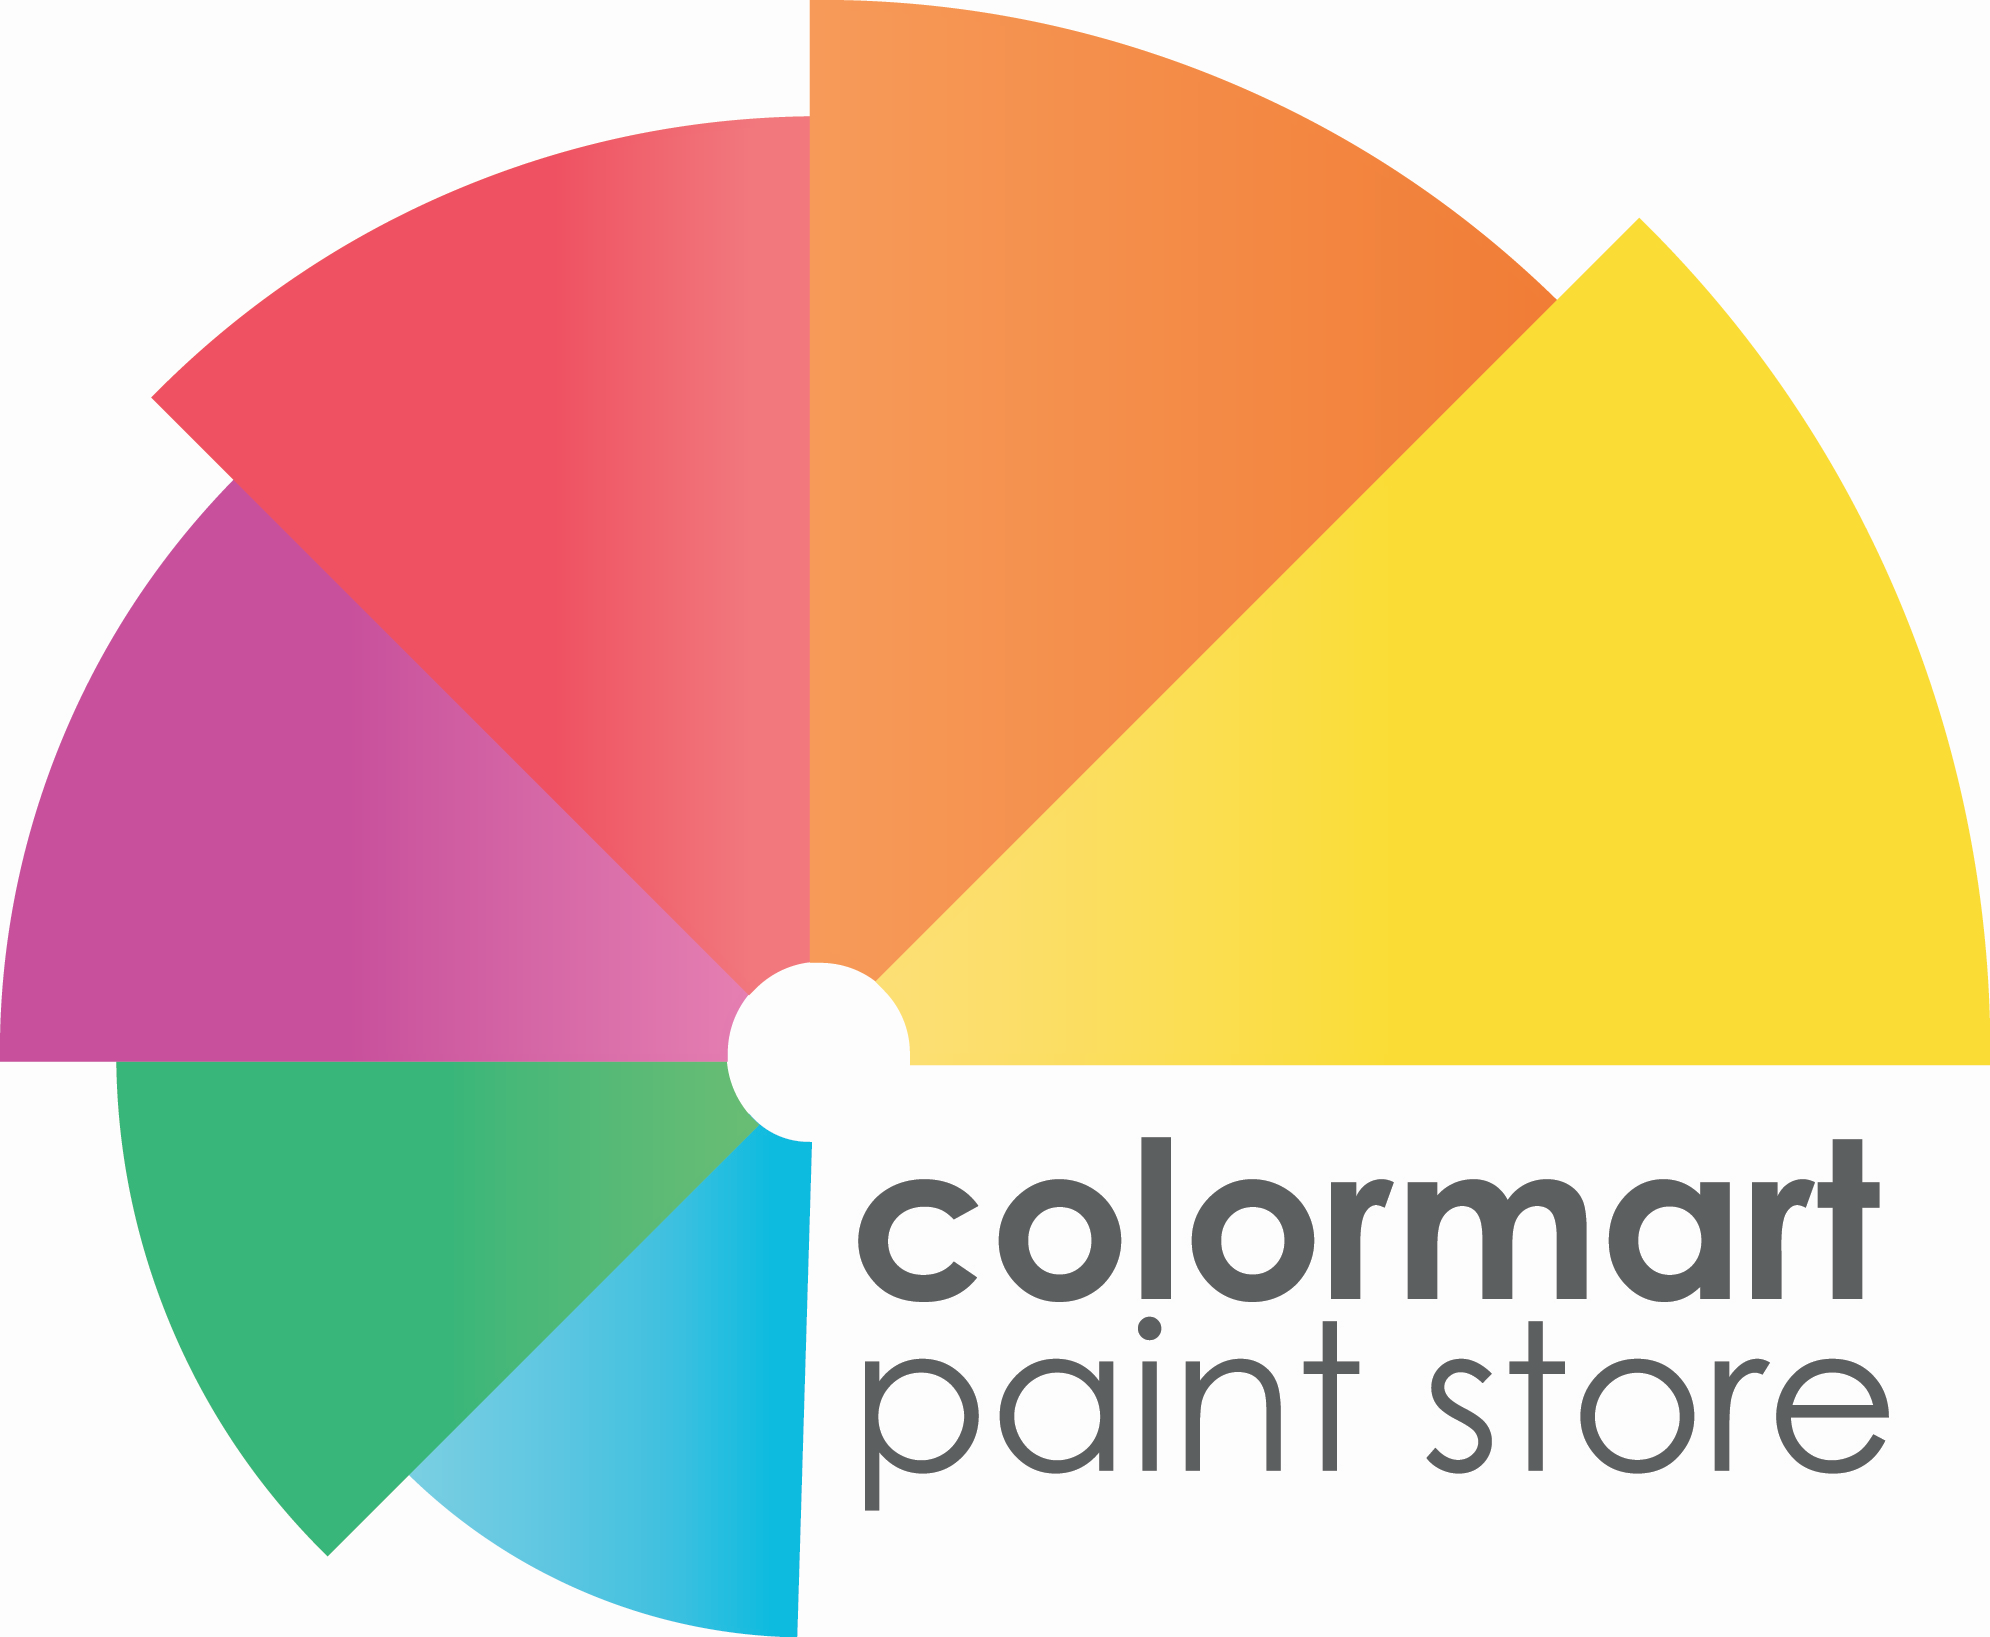 Colormart Paint Store image 4